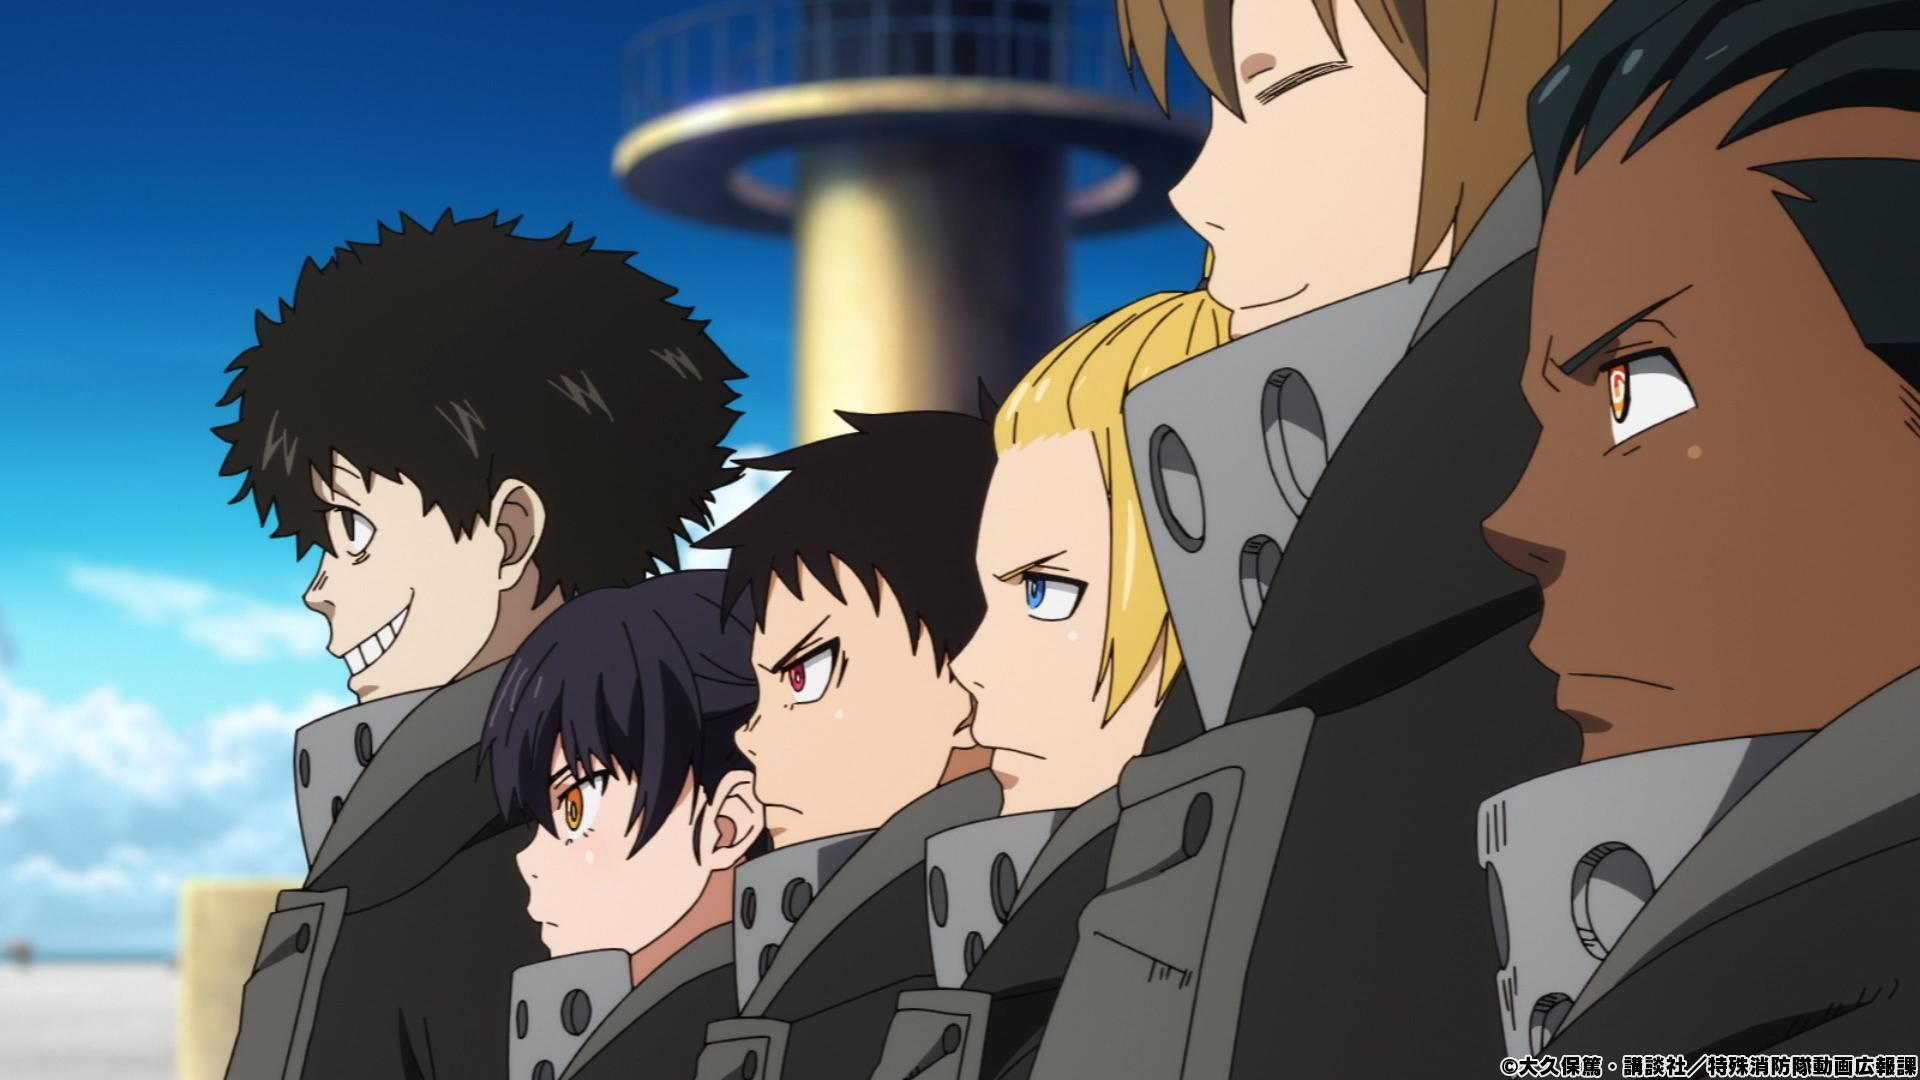 TVアニメ「炎炎ノ消防隊 弐ノ章」第2弾PV&第壱話のあらすじ・先行カット公開!7月3日より放送開始